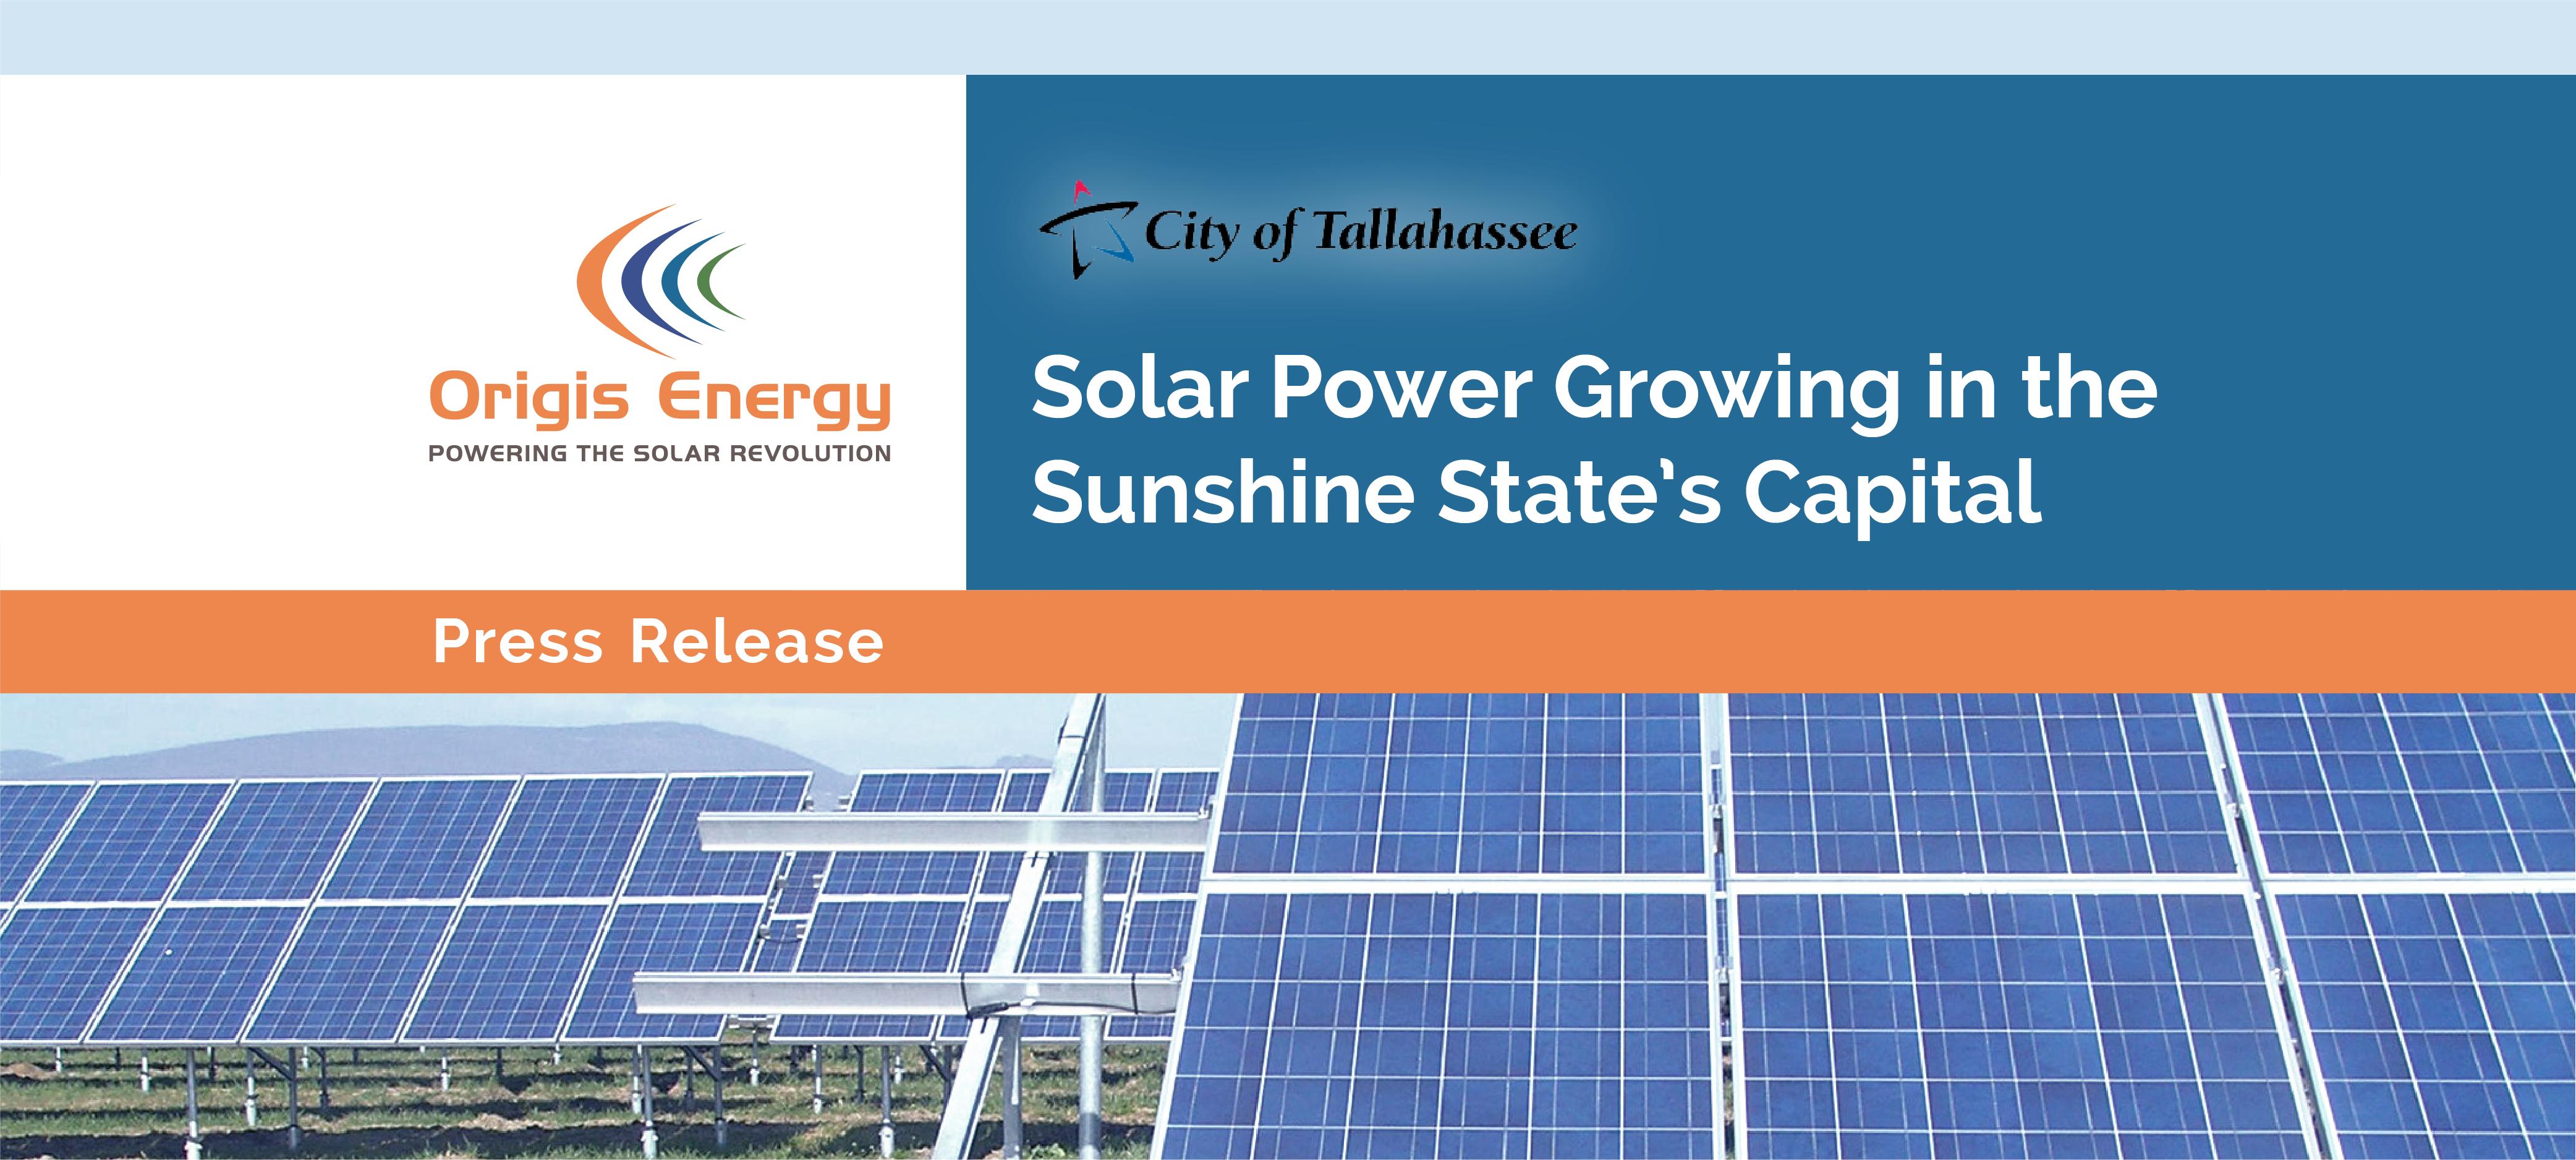 Origis Energy | City of Tallahassee Groundbreaking